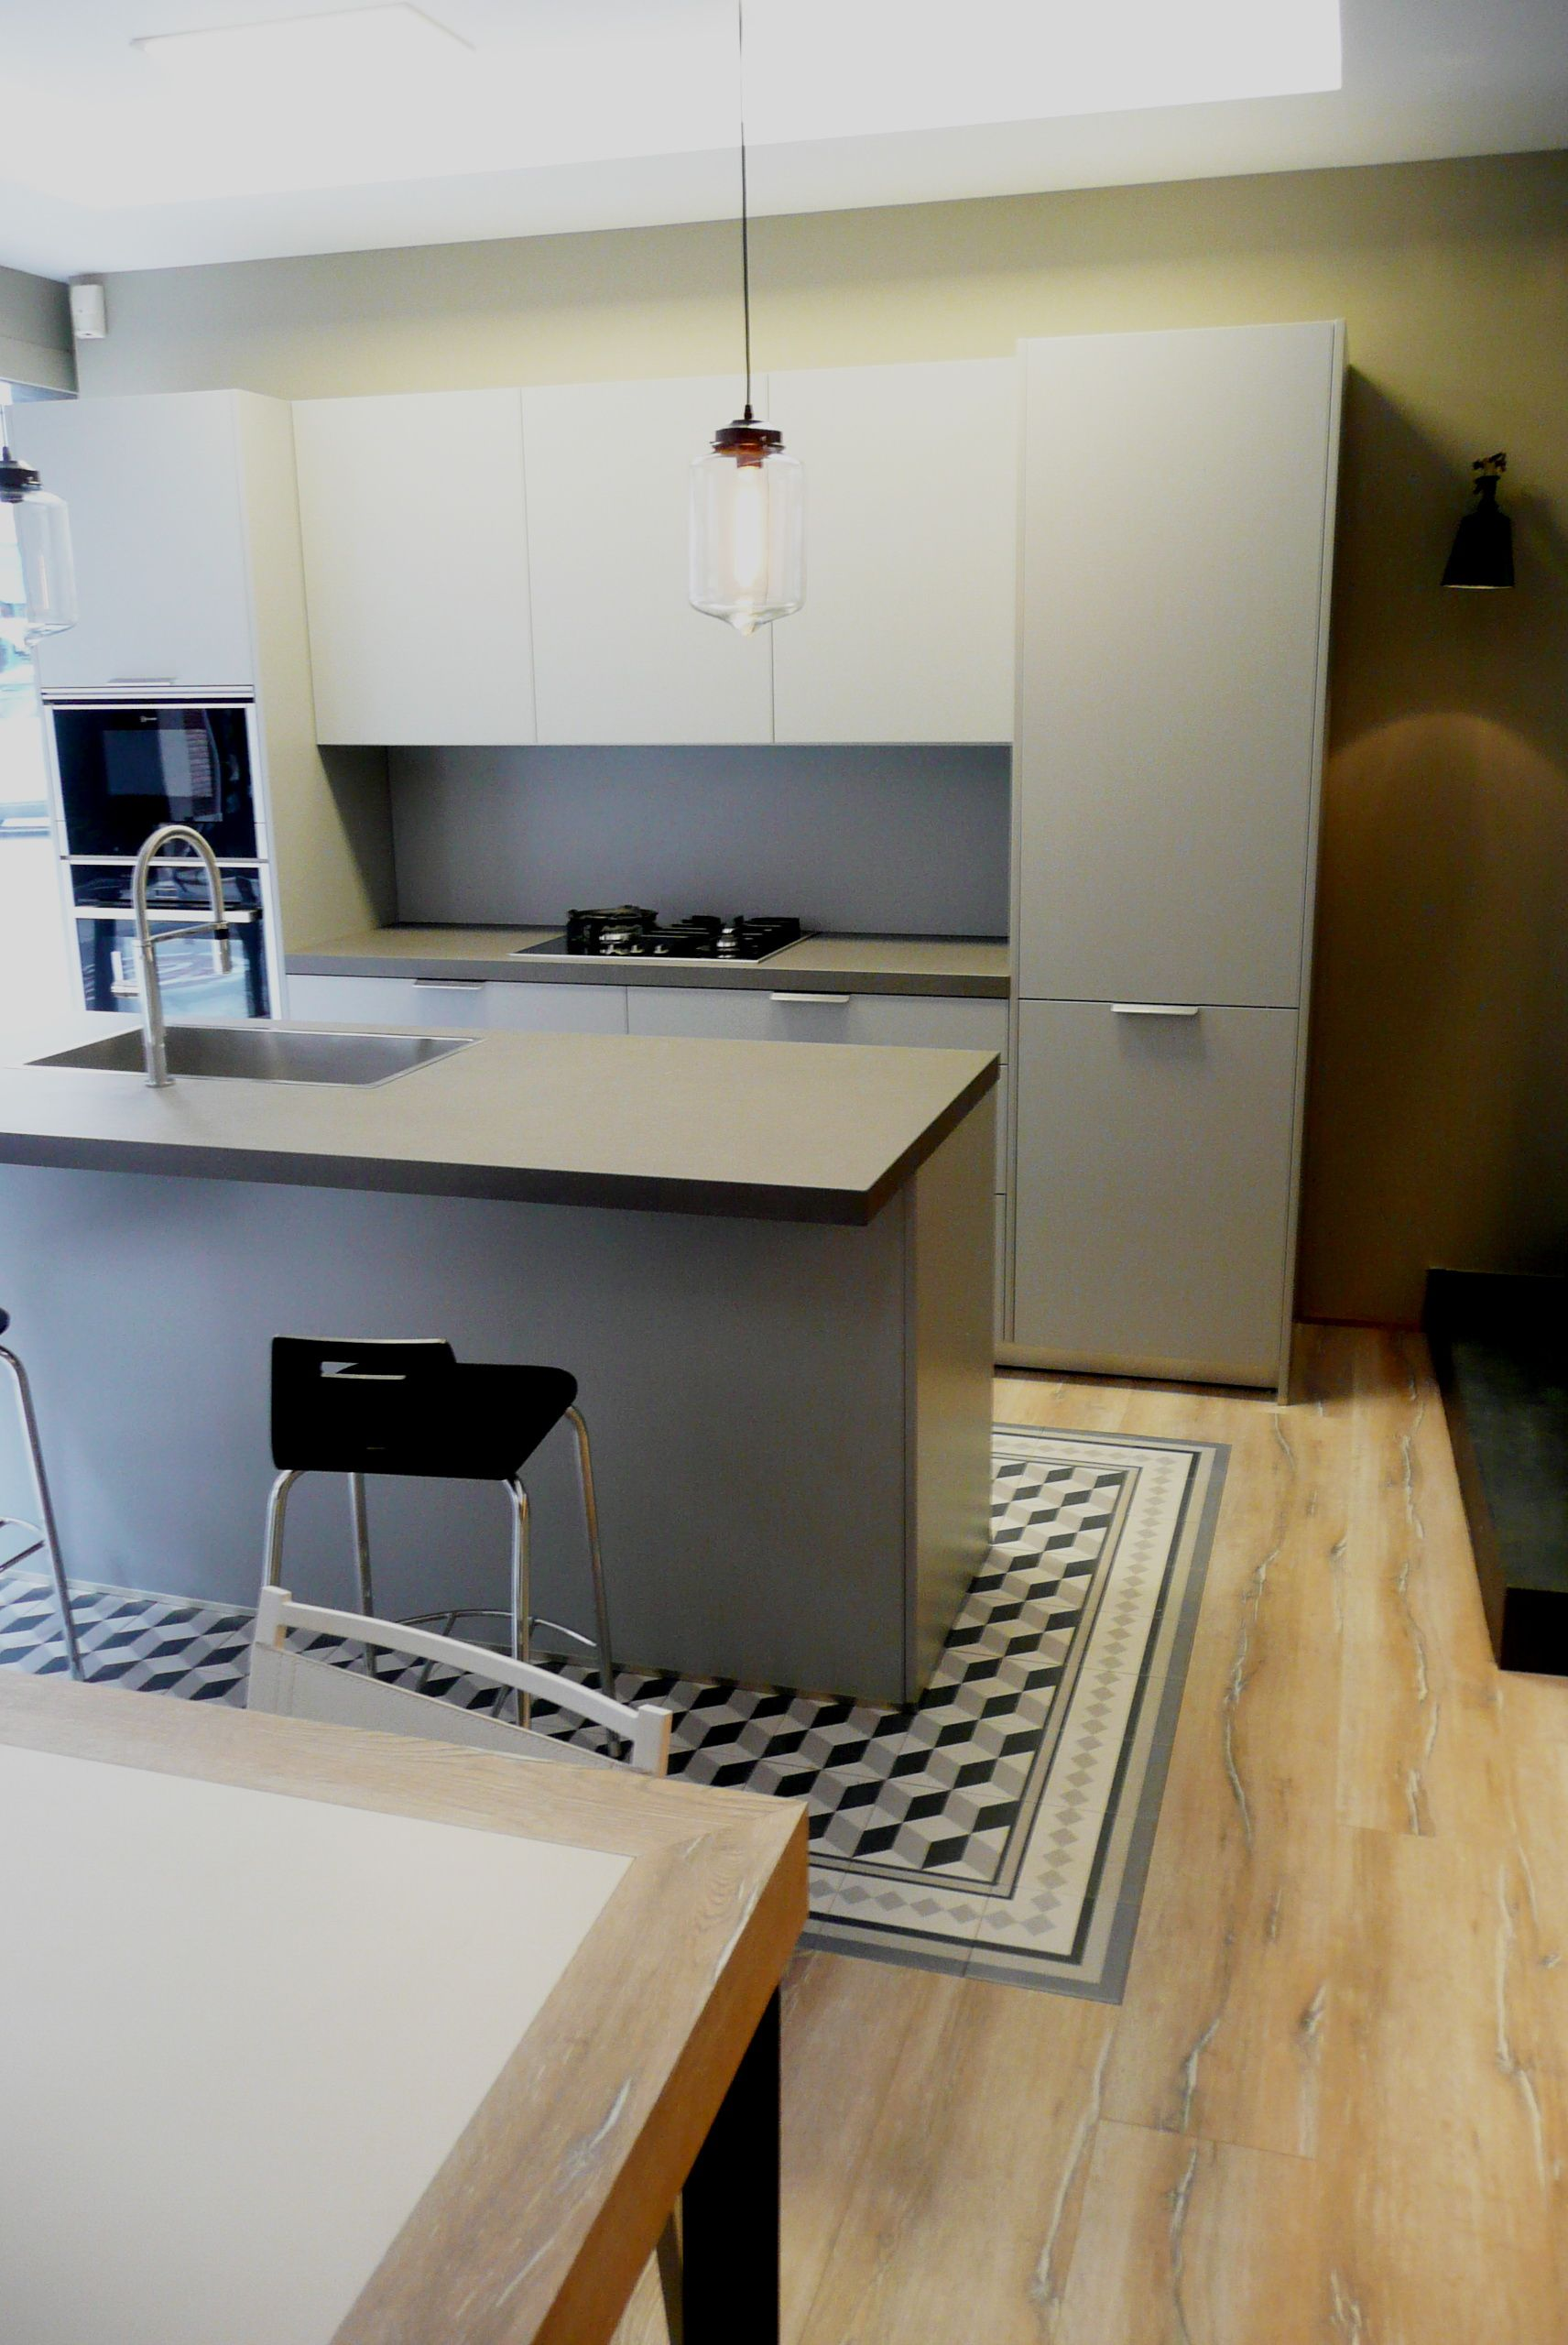 Santos cocina en color gris piedra modelo ariane2 con - Cocina suelo gris ...